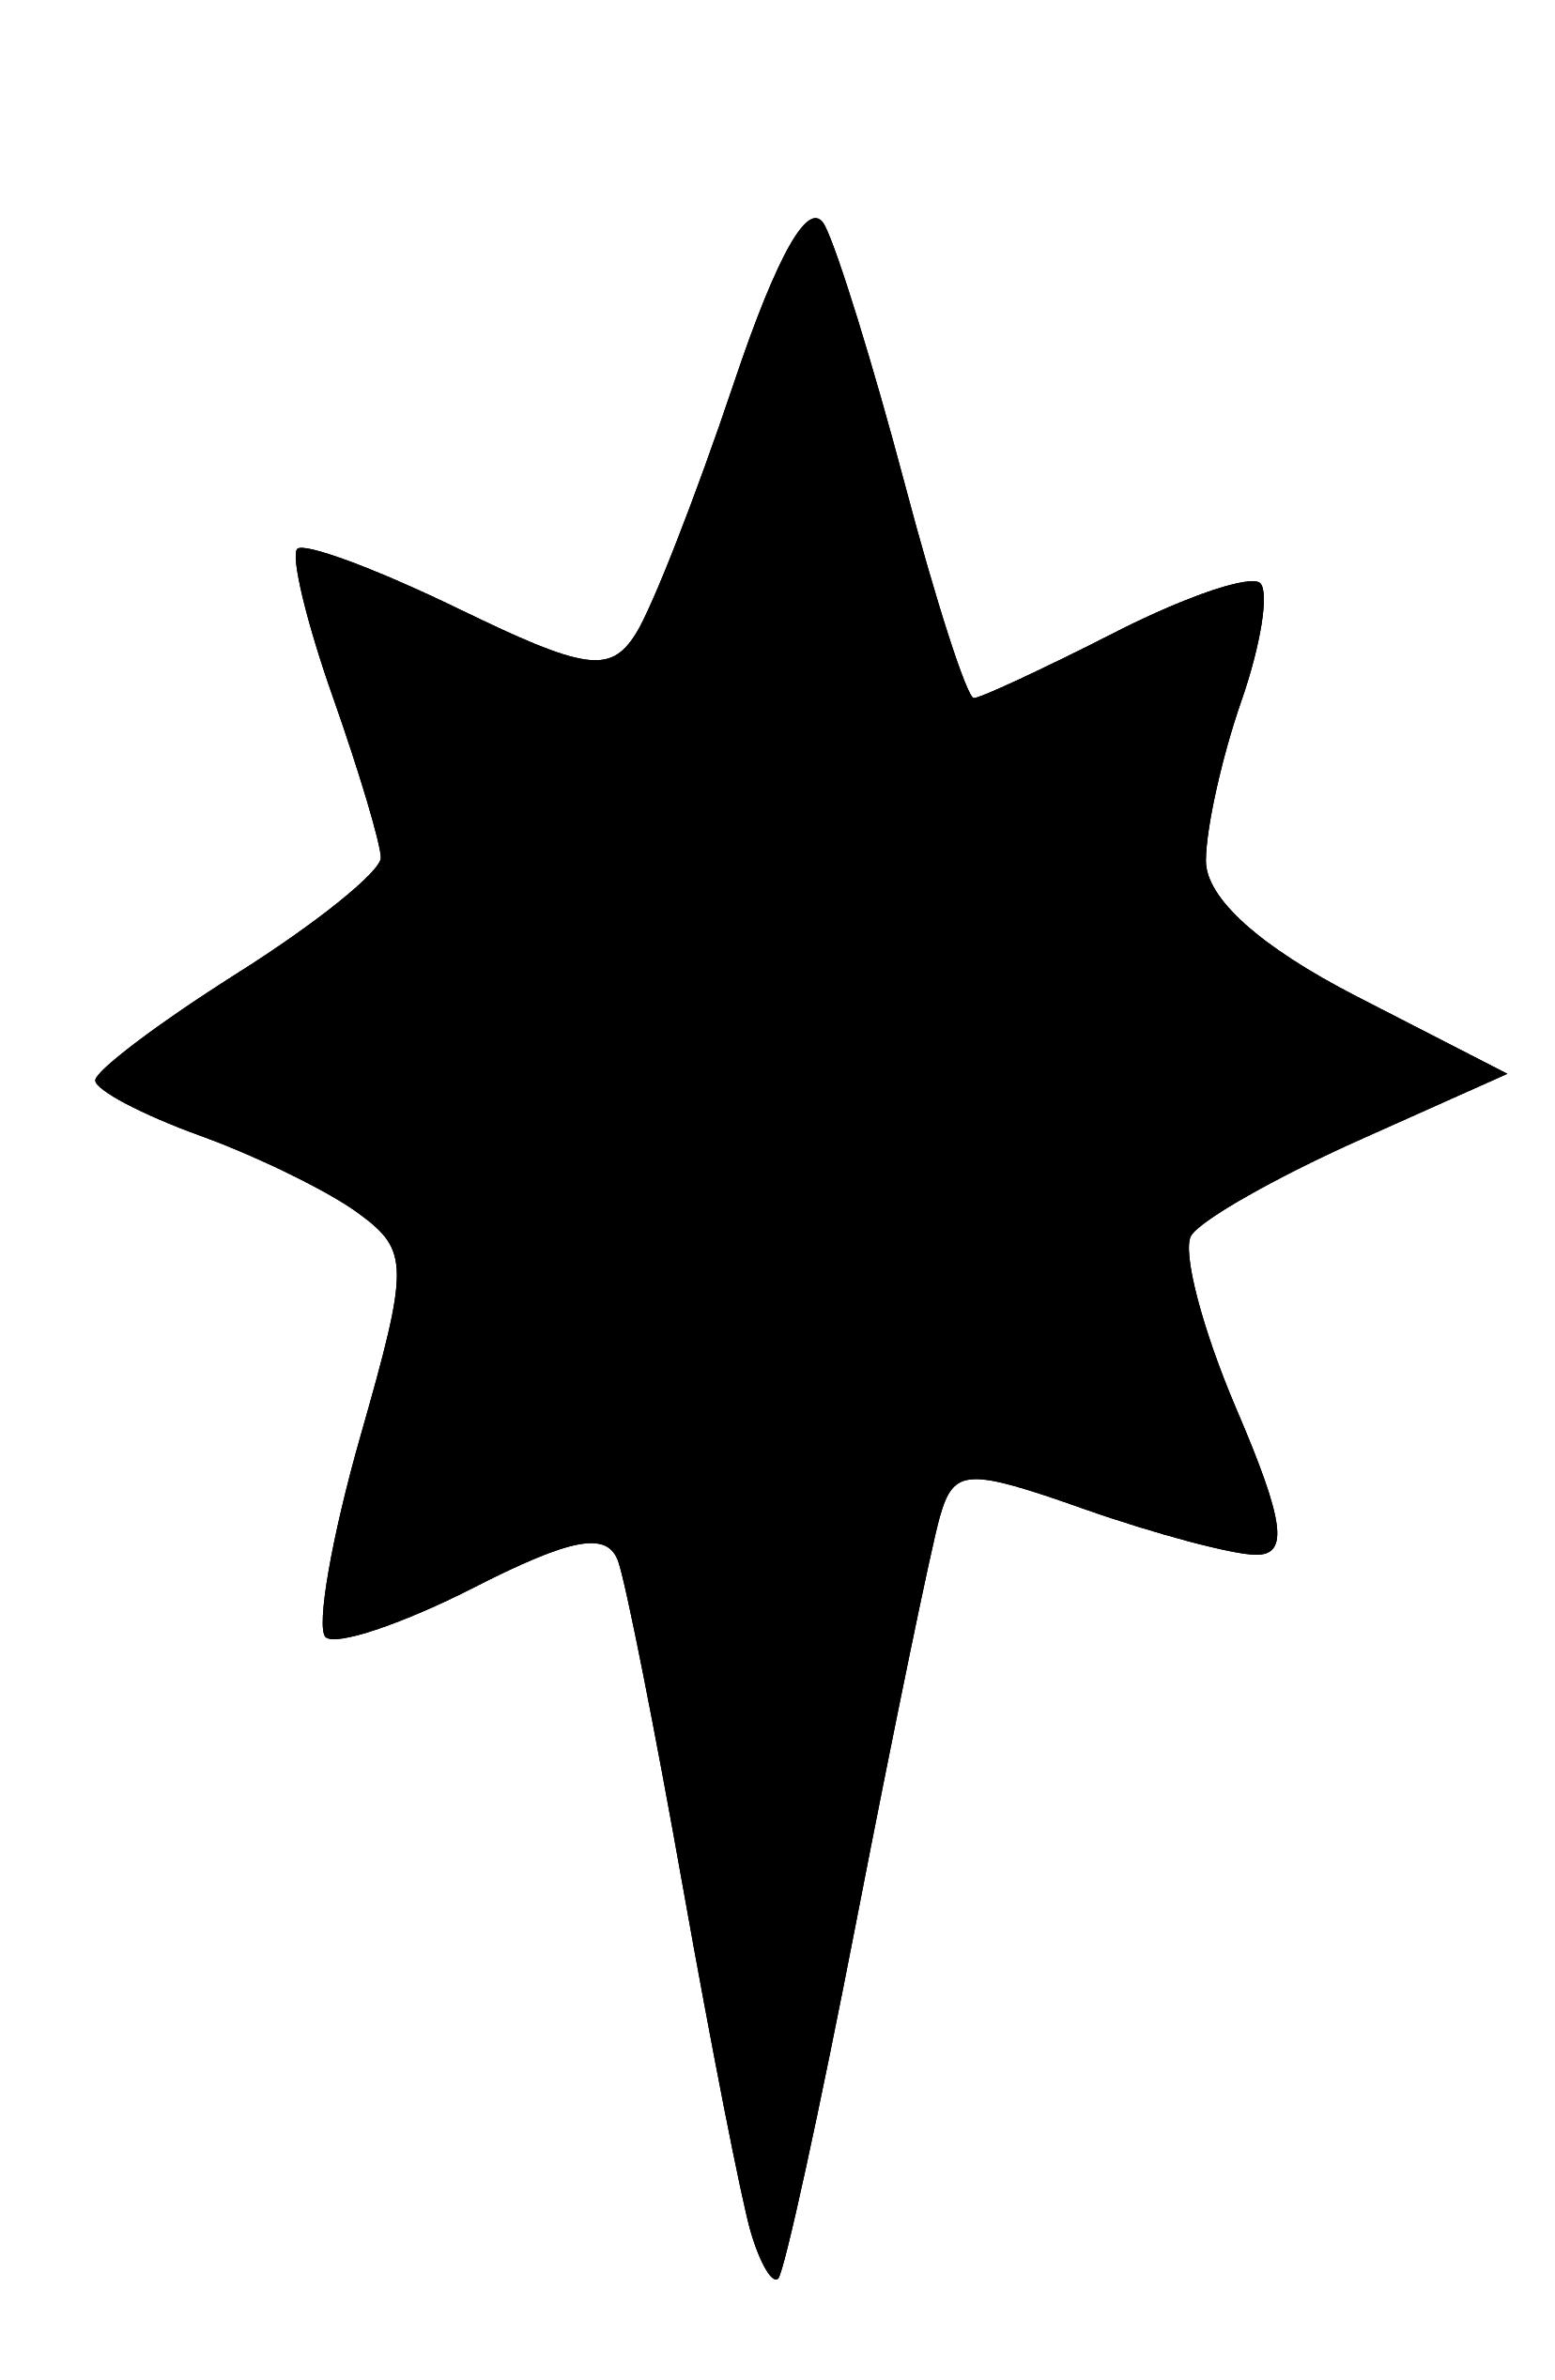 1656x2535 Image Christmas Star Silhouette Clip Art Image